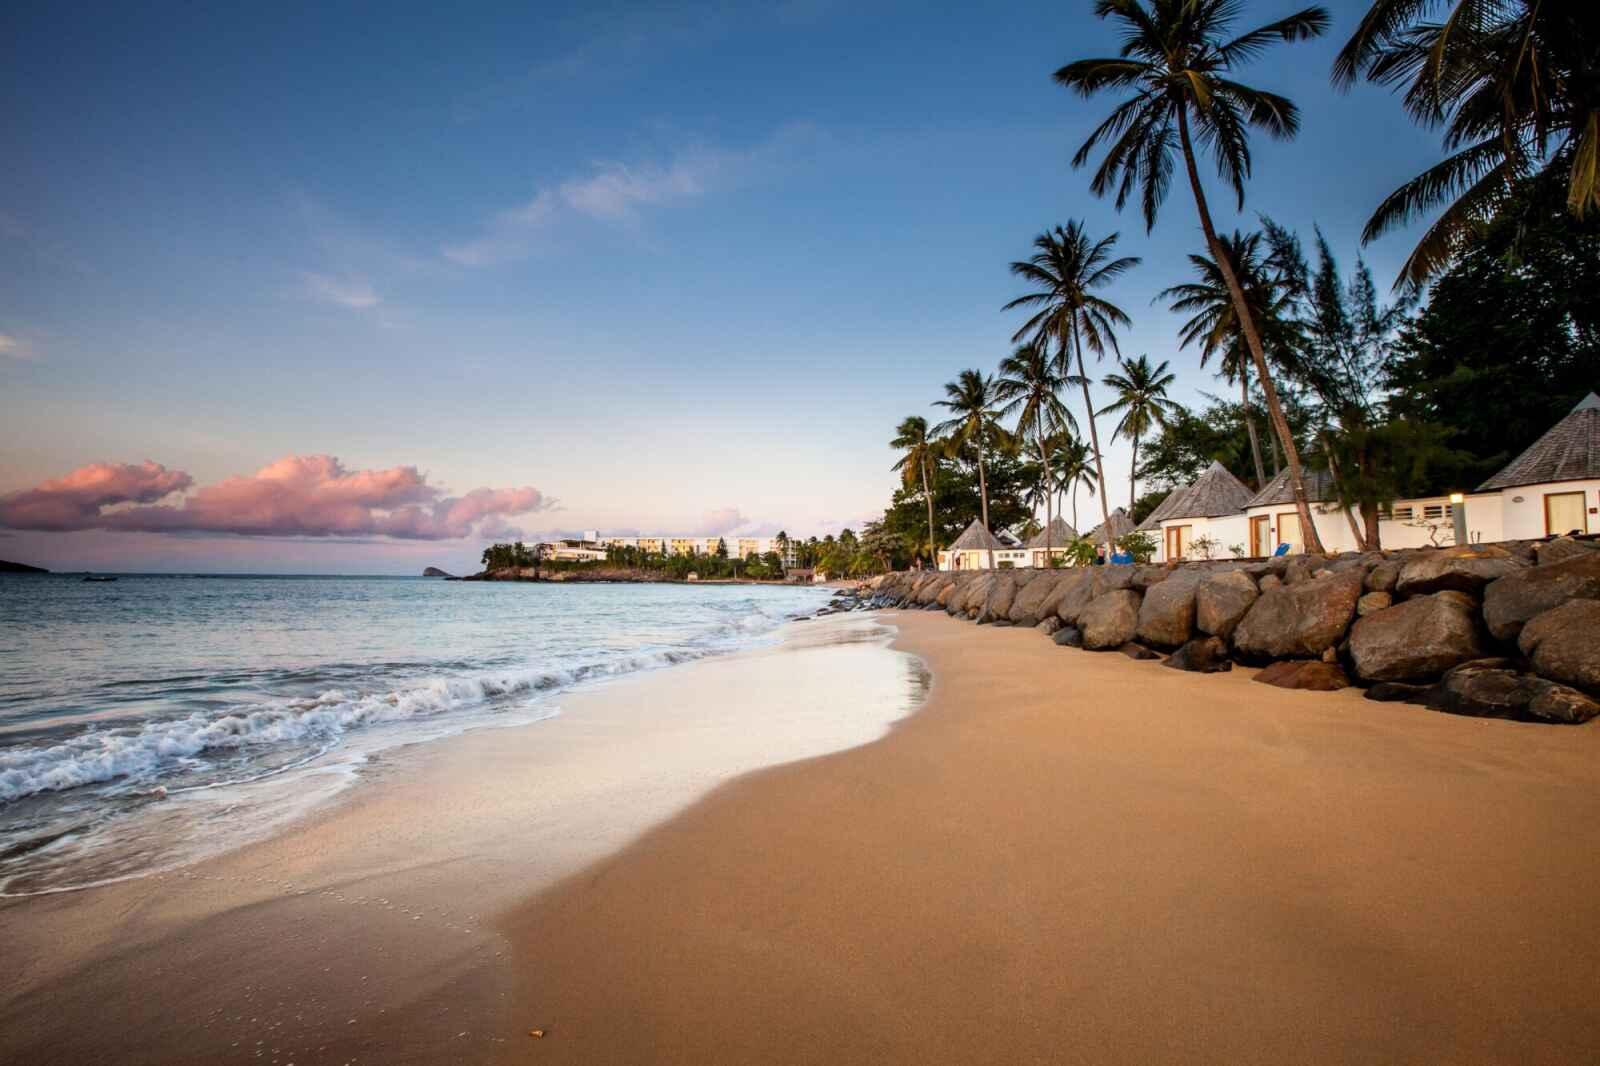 Guadeloupe : Langley Resort Fort Royal